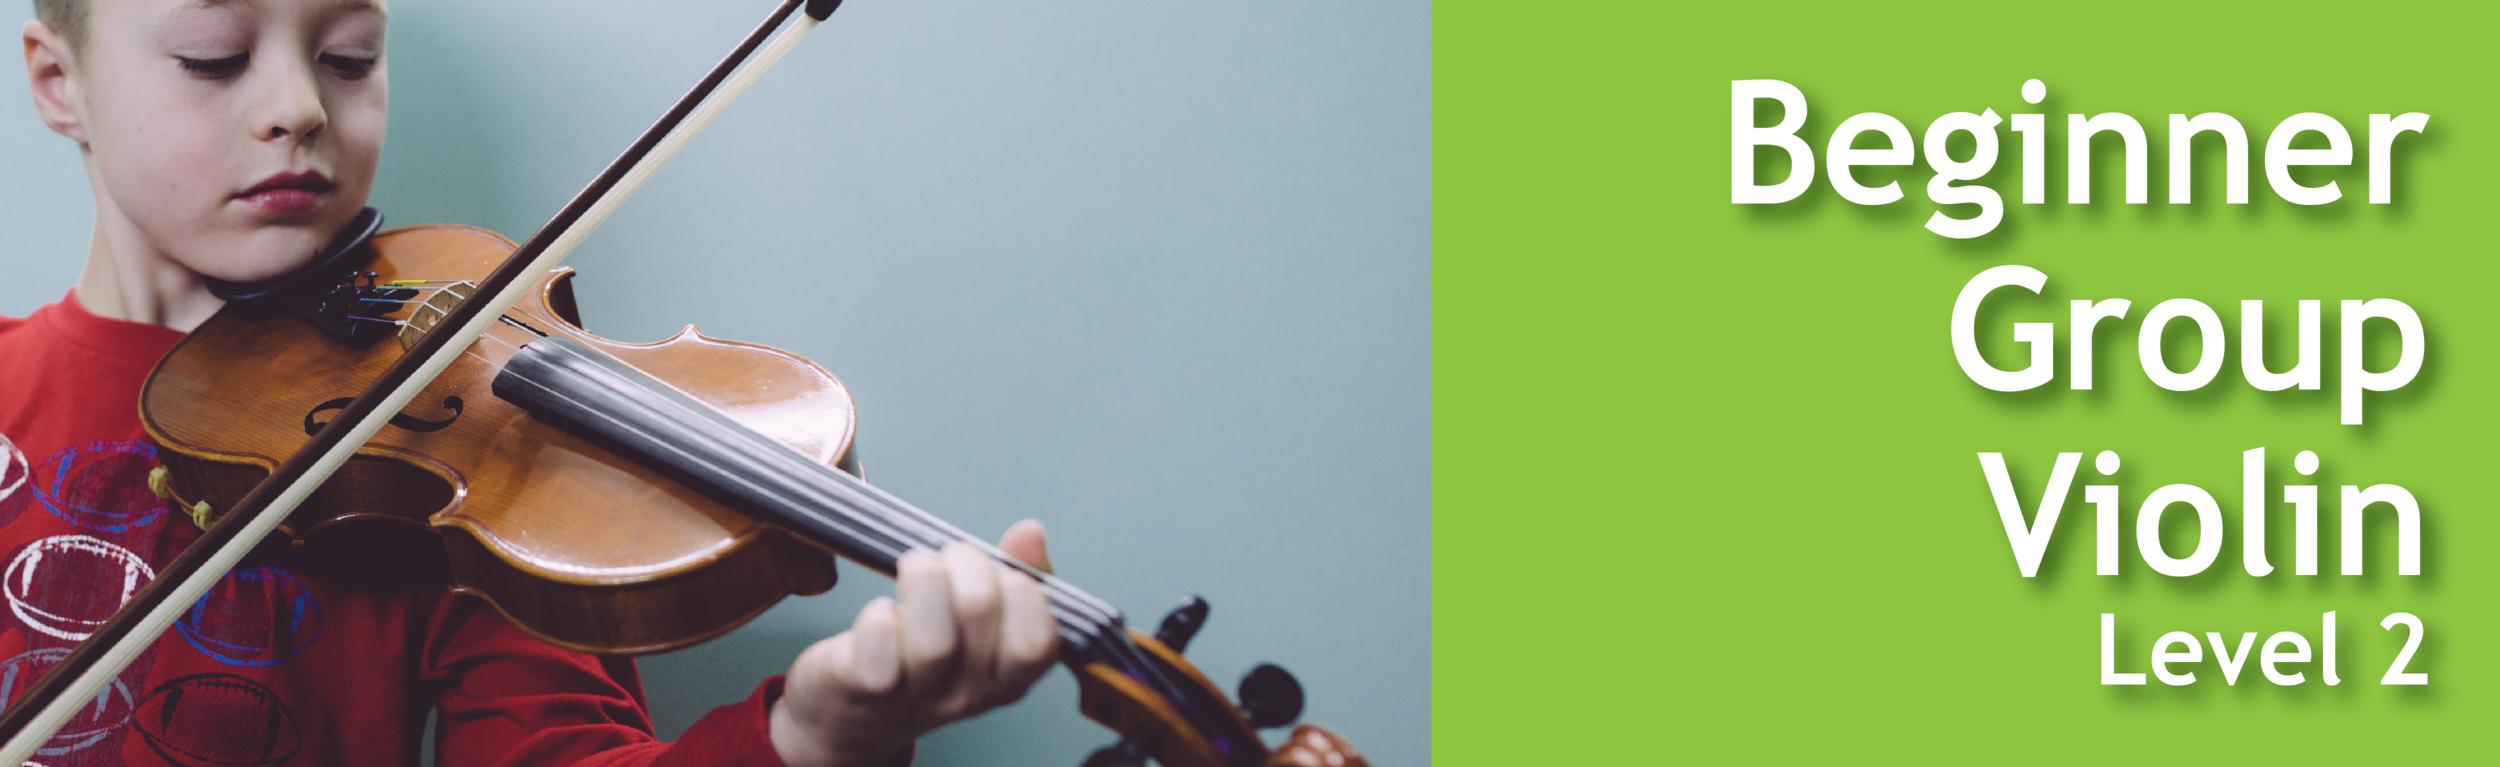 Beginner Group Violin Level 2